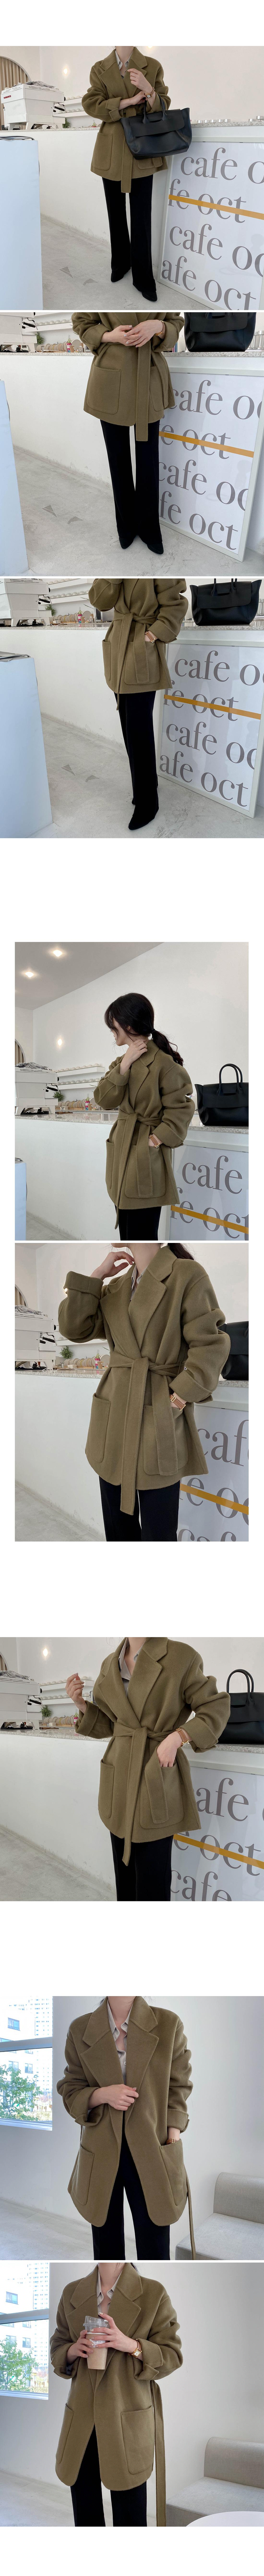 Darth robe handmade half coat